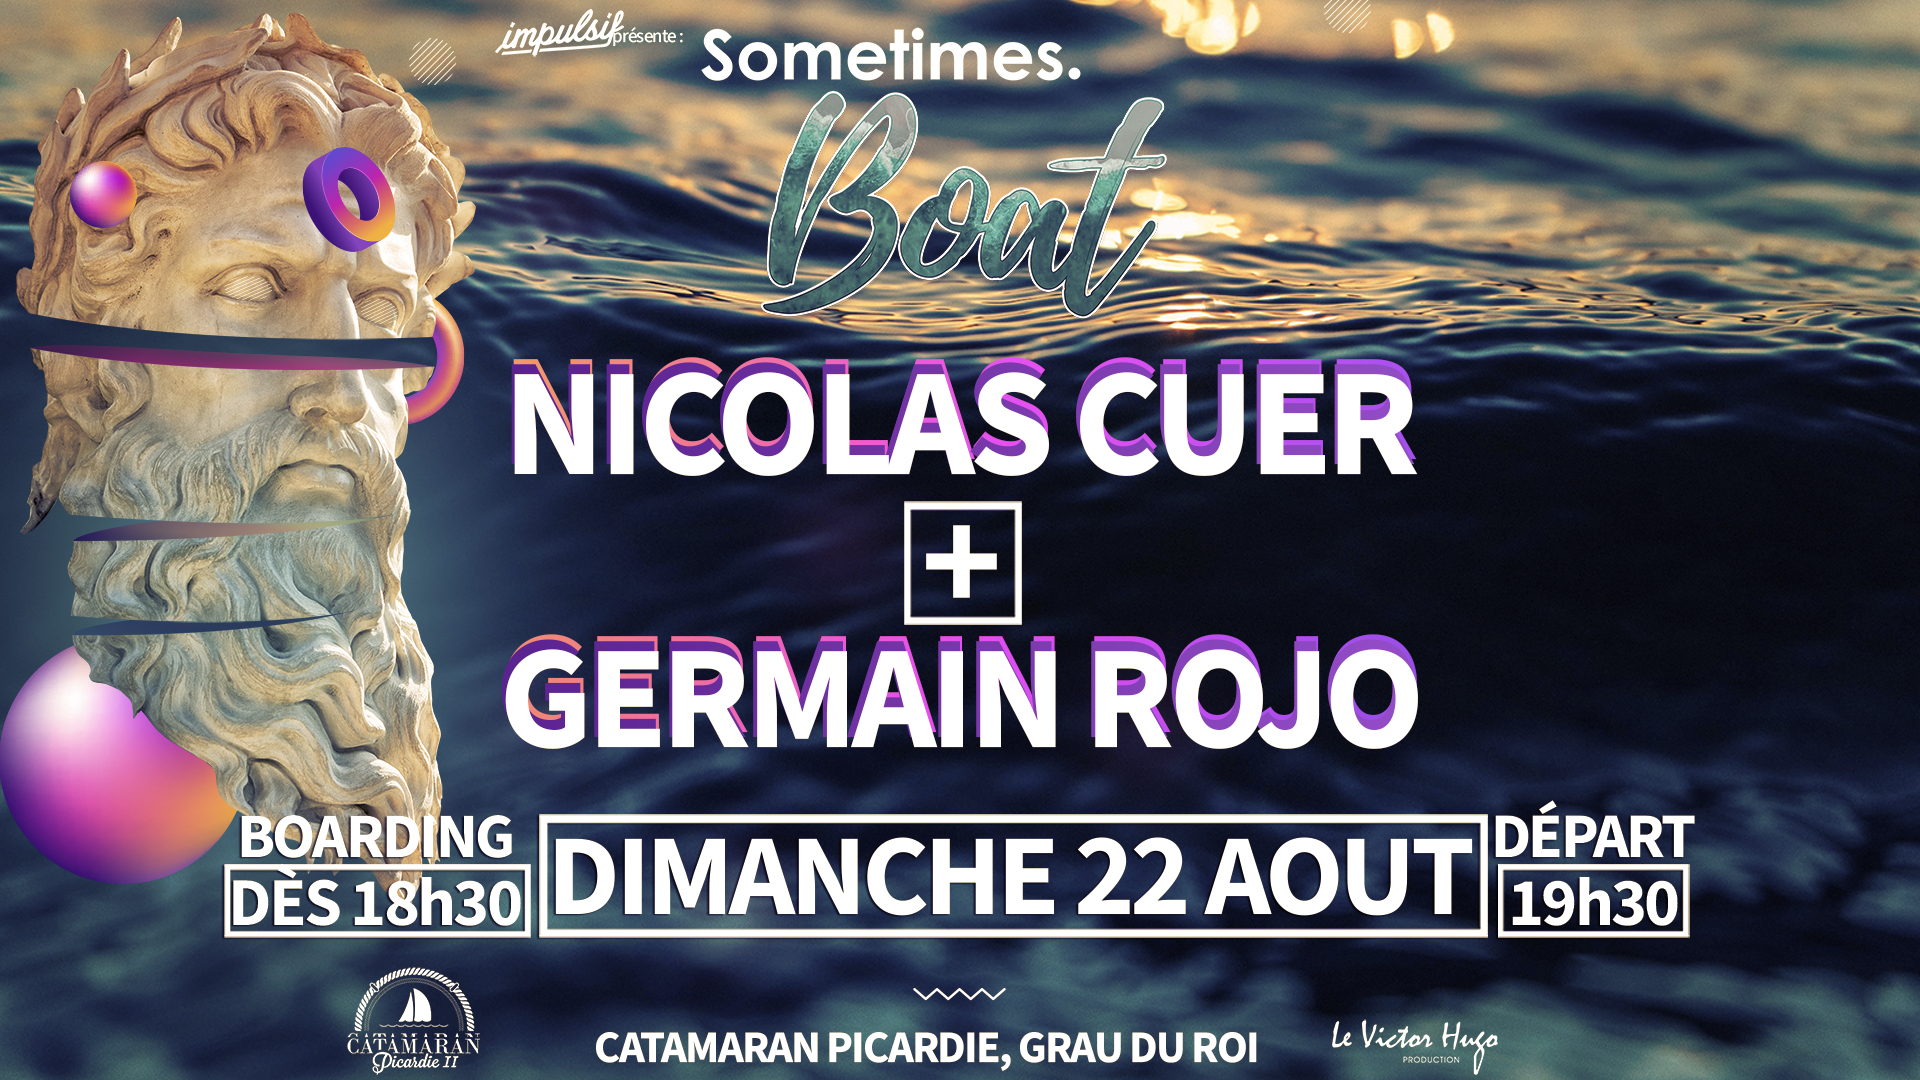 Sometimes. BOAT 2 w/ Nicolas Cuer & Germain Rojo / 22 aout